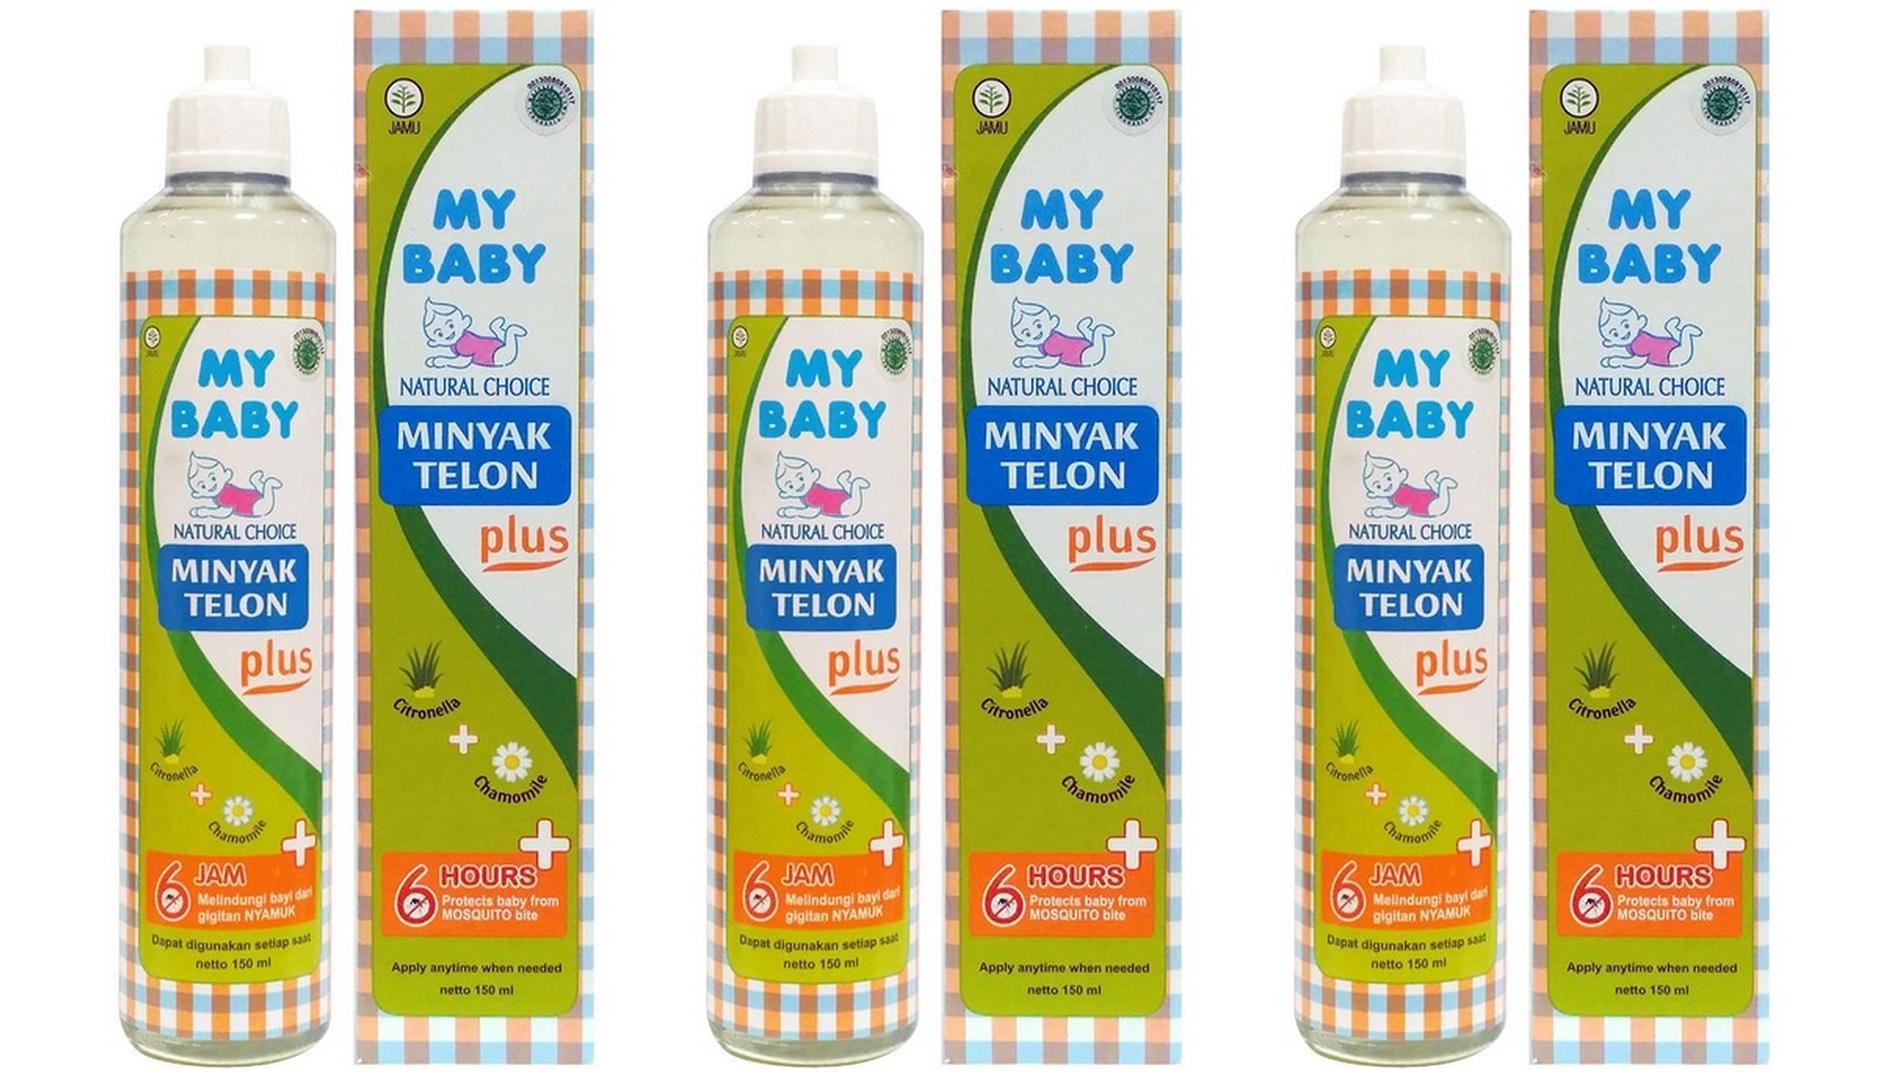 Hot Item My Baby Minyak Telon Plus 150 Ml 3 Pcs Daftar Harga Paket Hemat Longer Protection 60ml 3pcs Mtk040